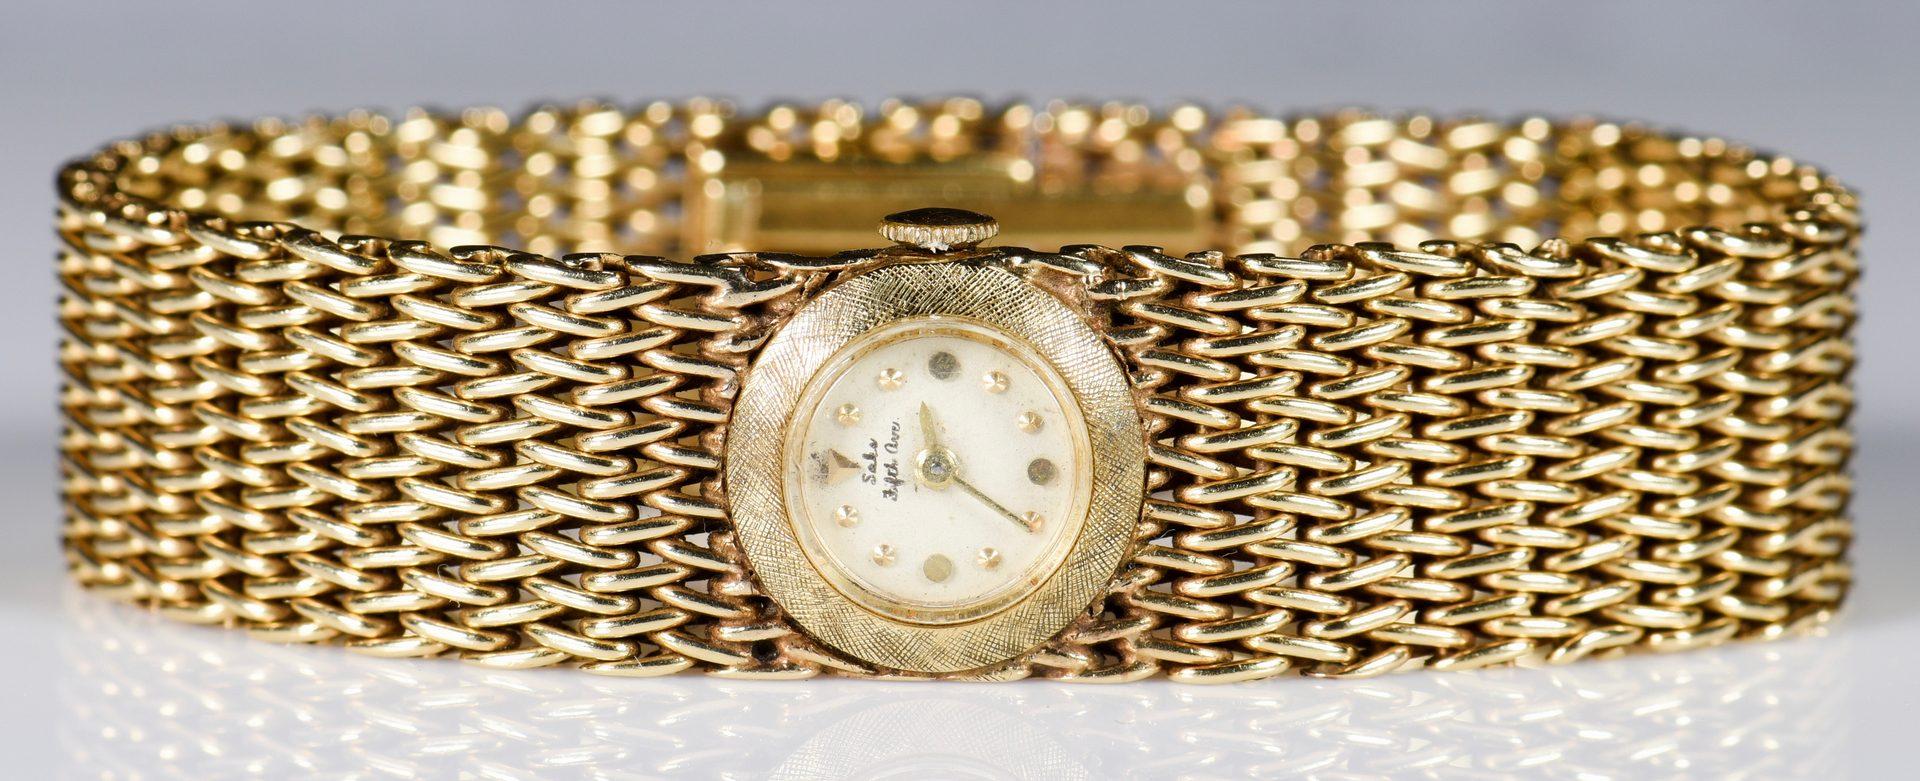 Lot 948: 14K Bracelet Watch, Saks